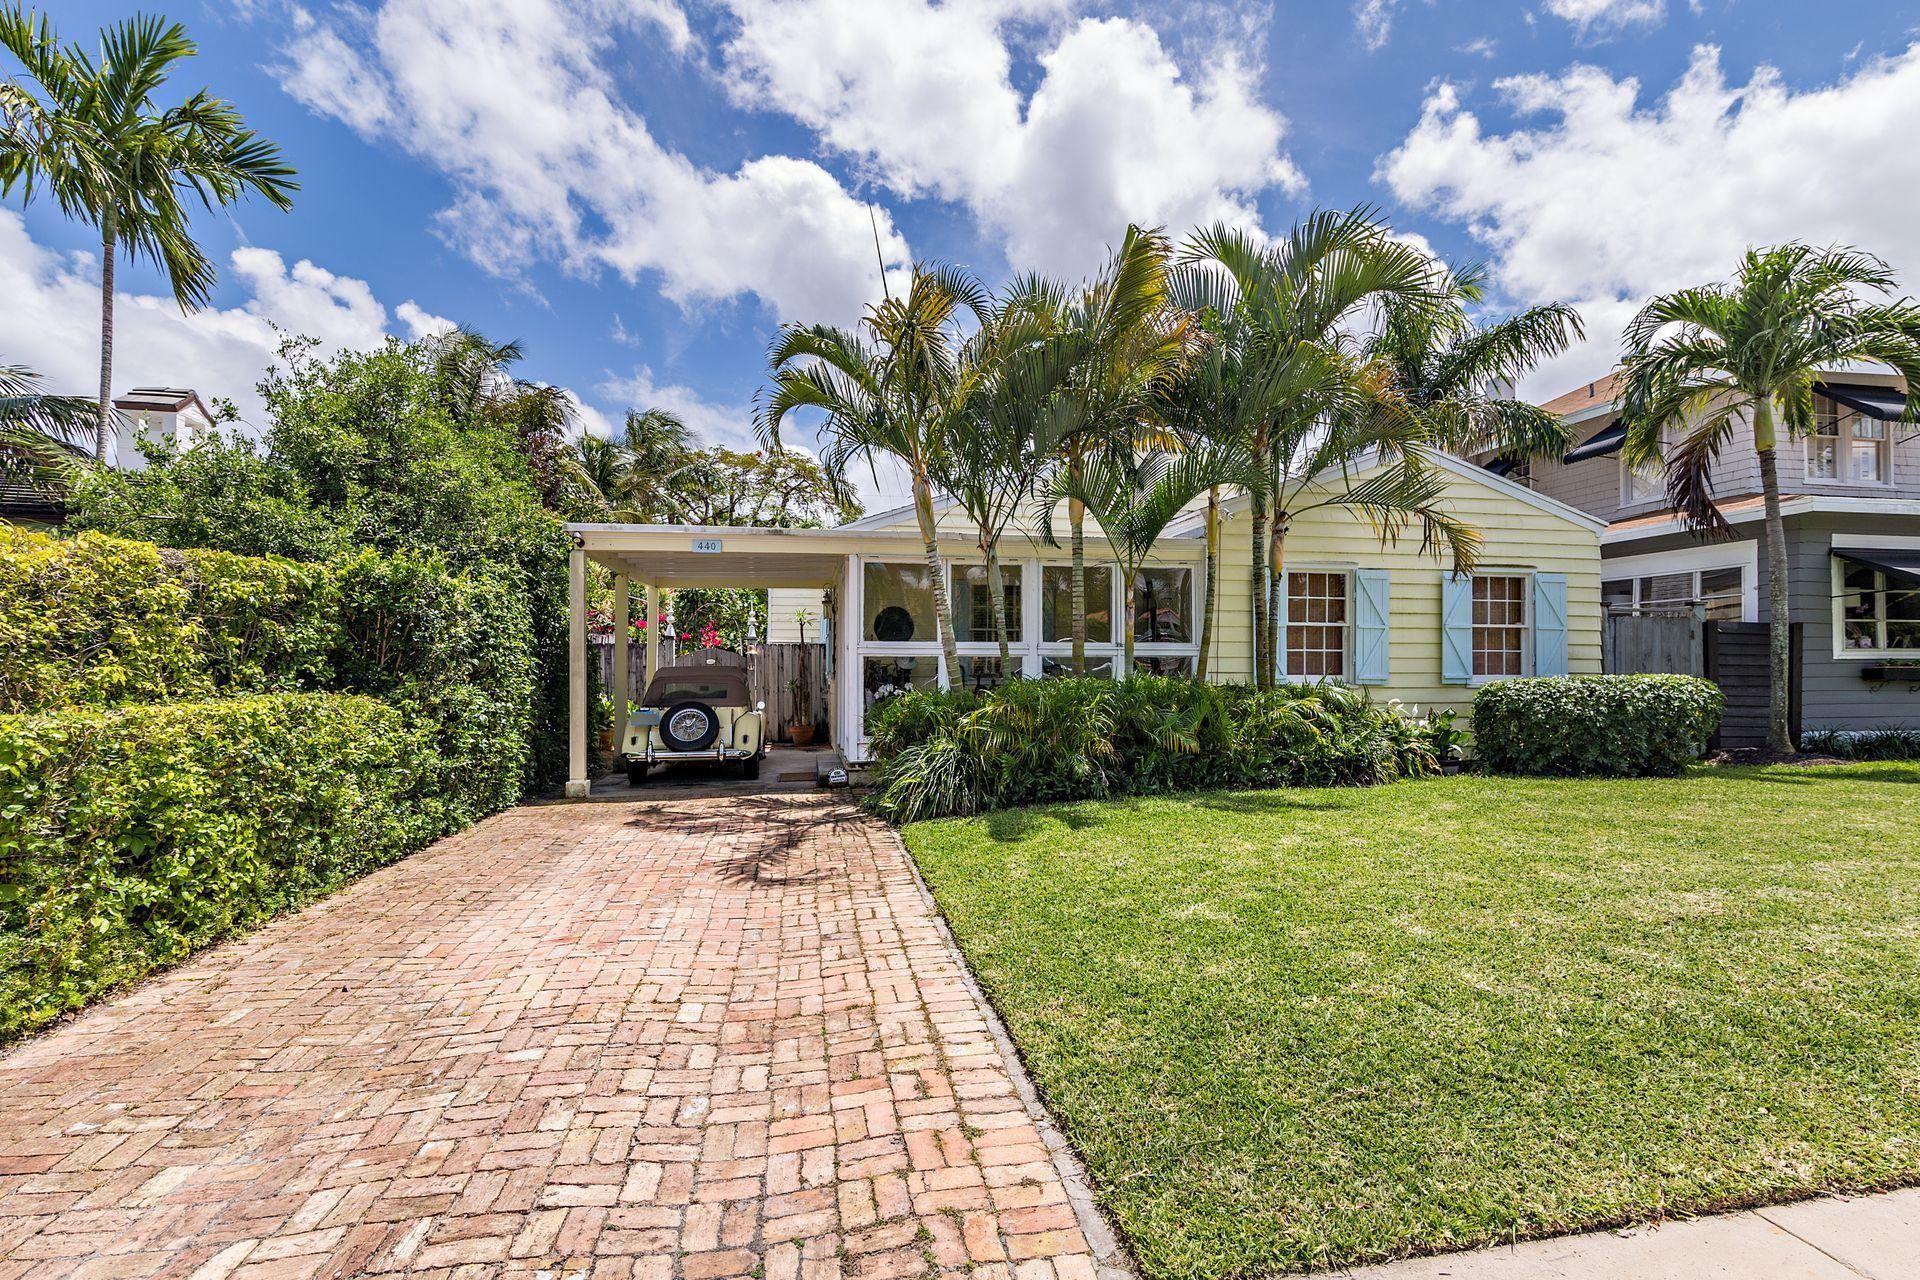 440 28th Street, West Palm Beach, FL 33407 - MLS#: RX-10717954